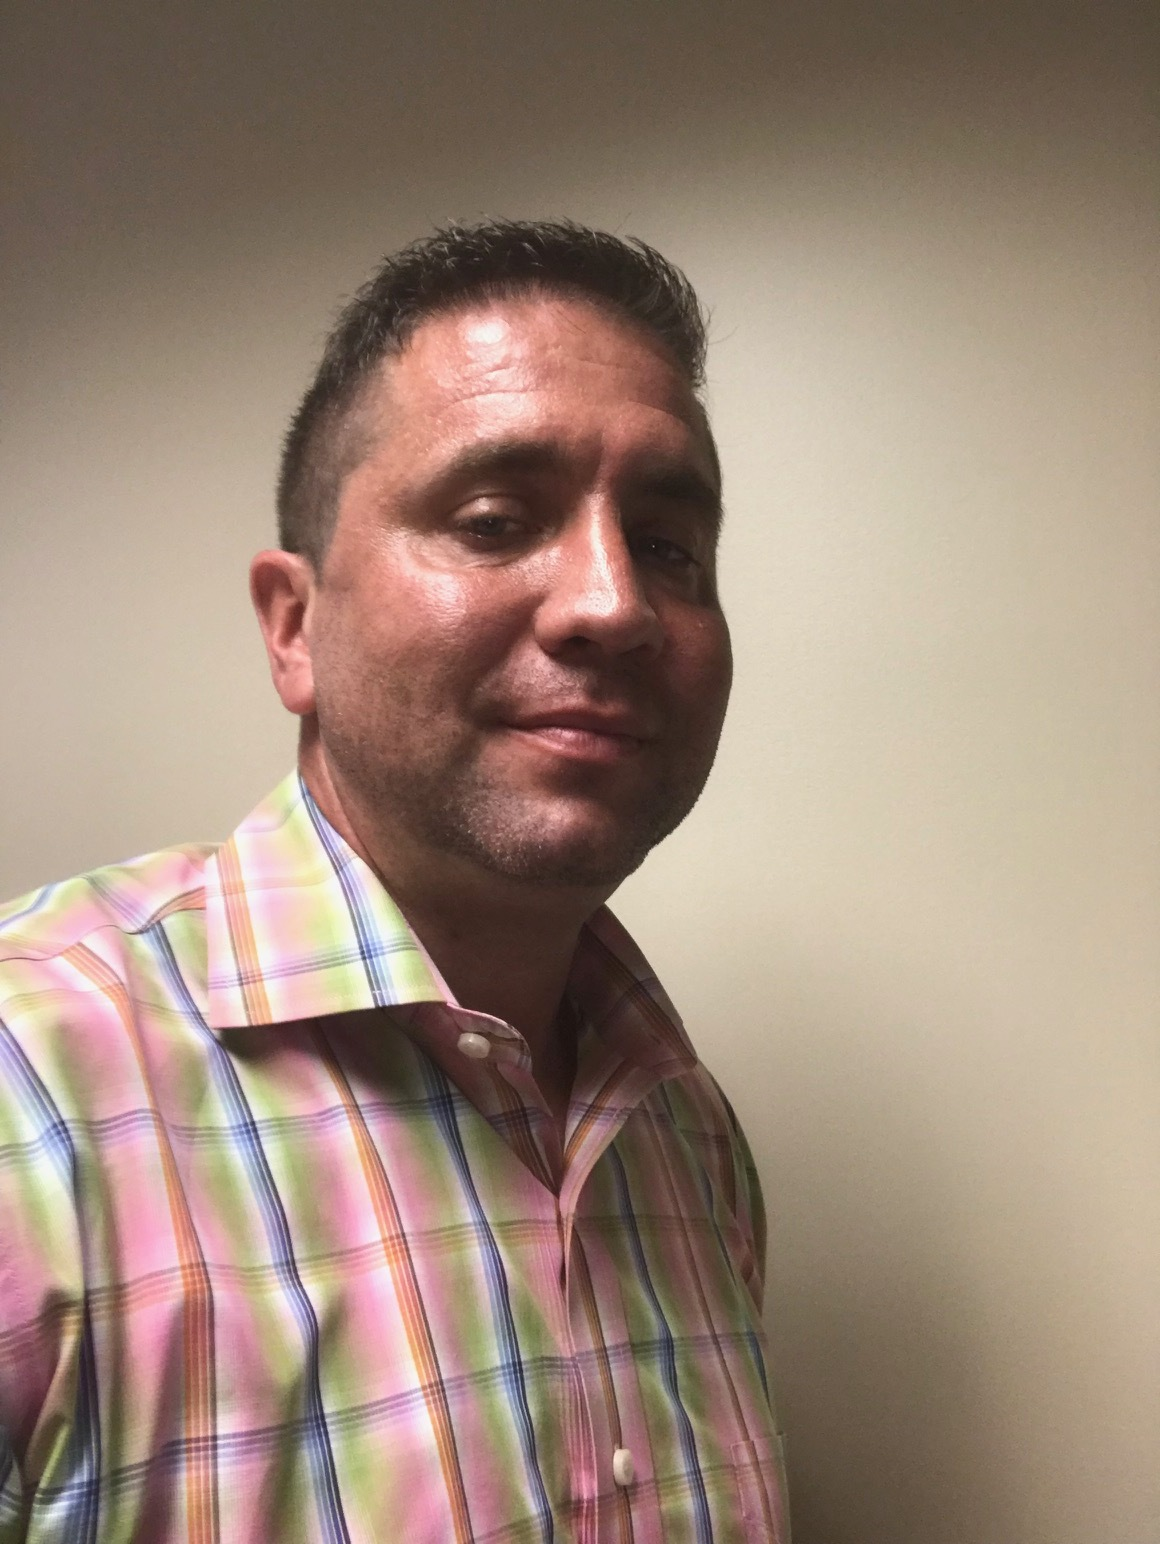 Kevin Hagler - Kevin Hagler is Director of Marketing at Diversified Medical Staff and Home Care.